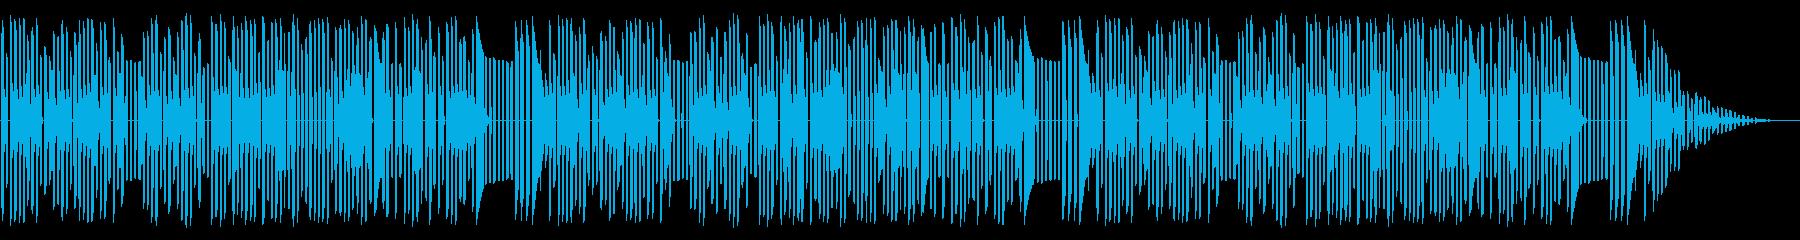 NES 汎用 C03-1(ステージ2) の再生済みの波形